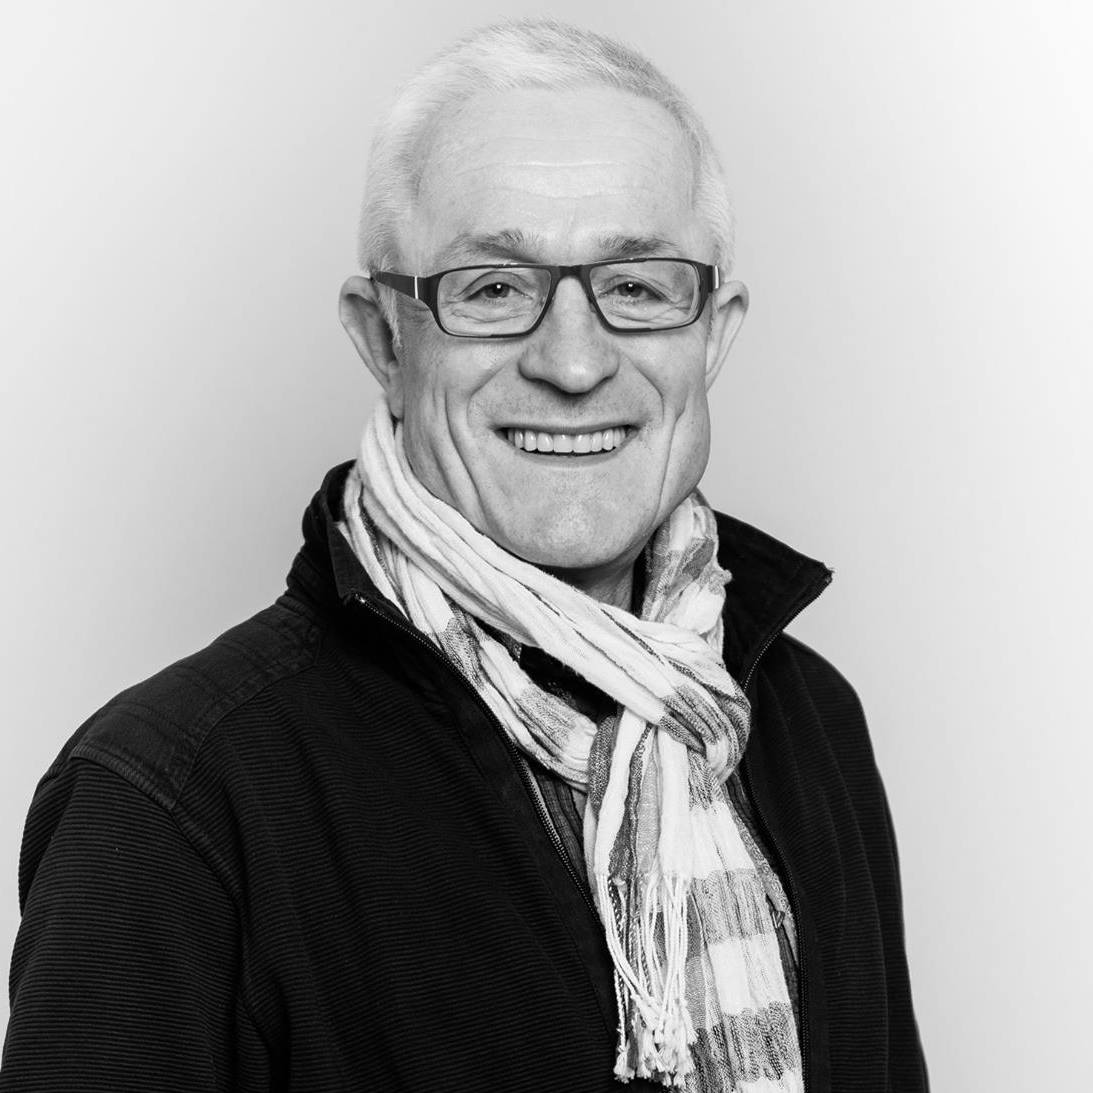 Yves Prepoignot